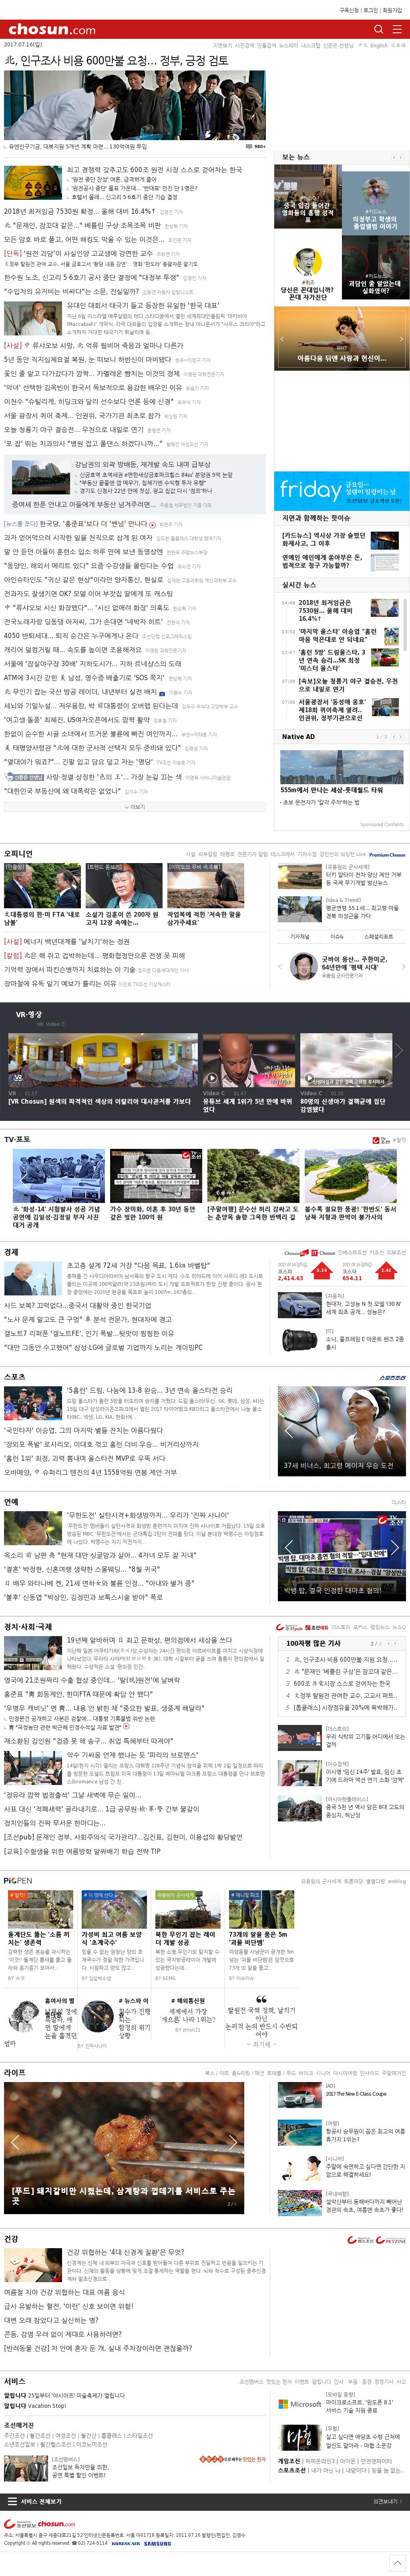 chosun.com at Saturday July 15, 2017, 5:02 p.m. UTC